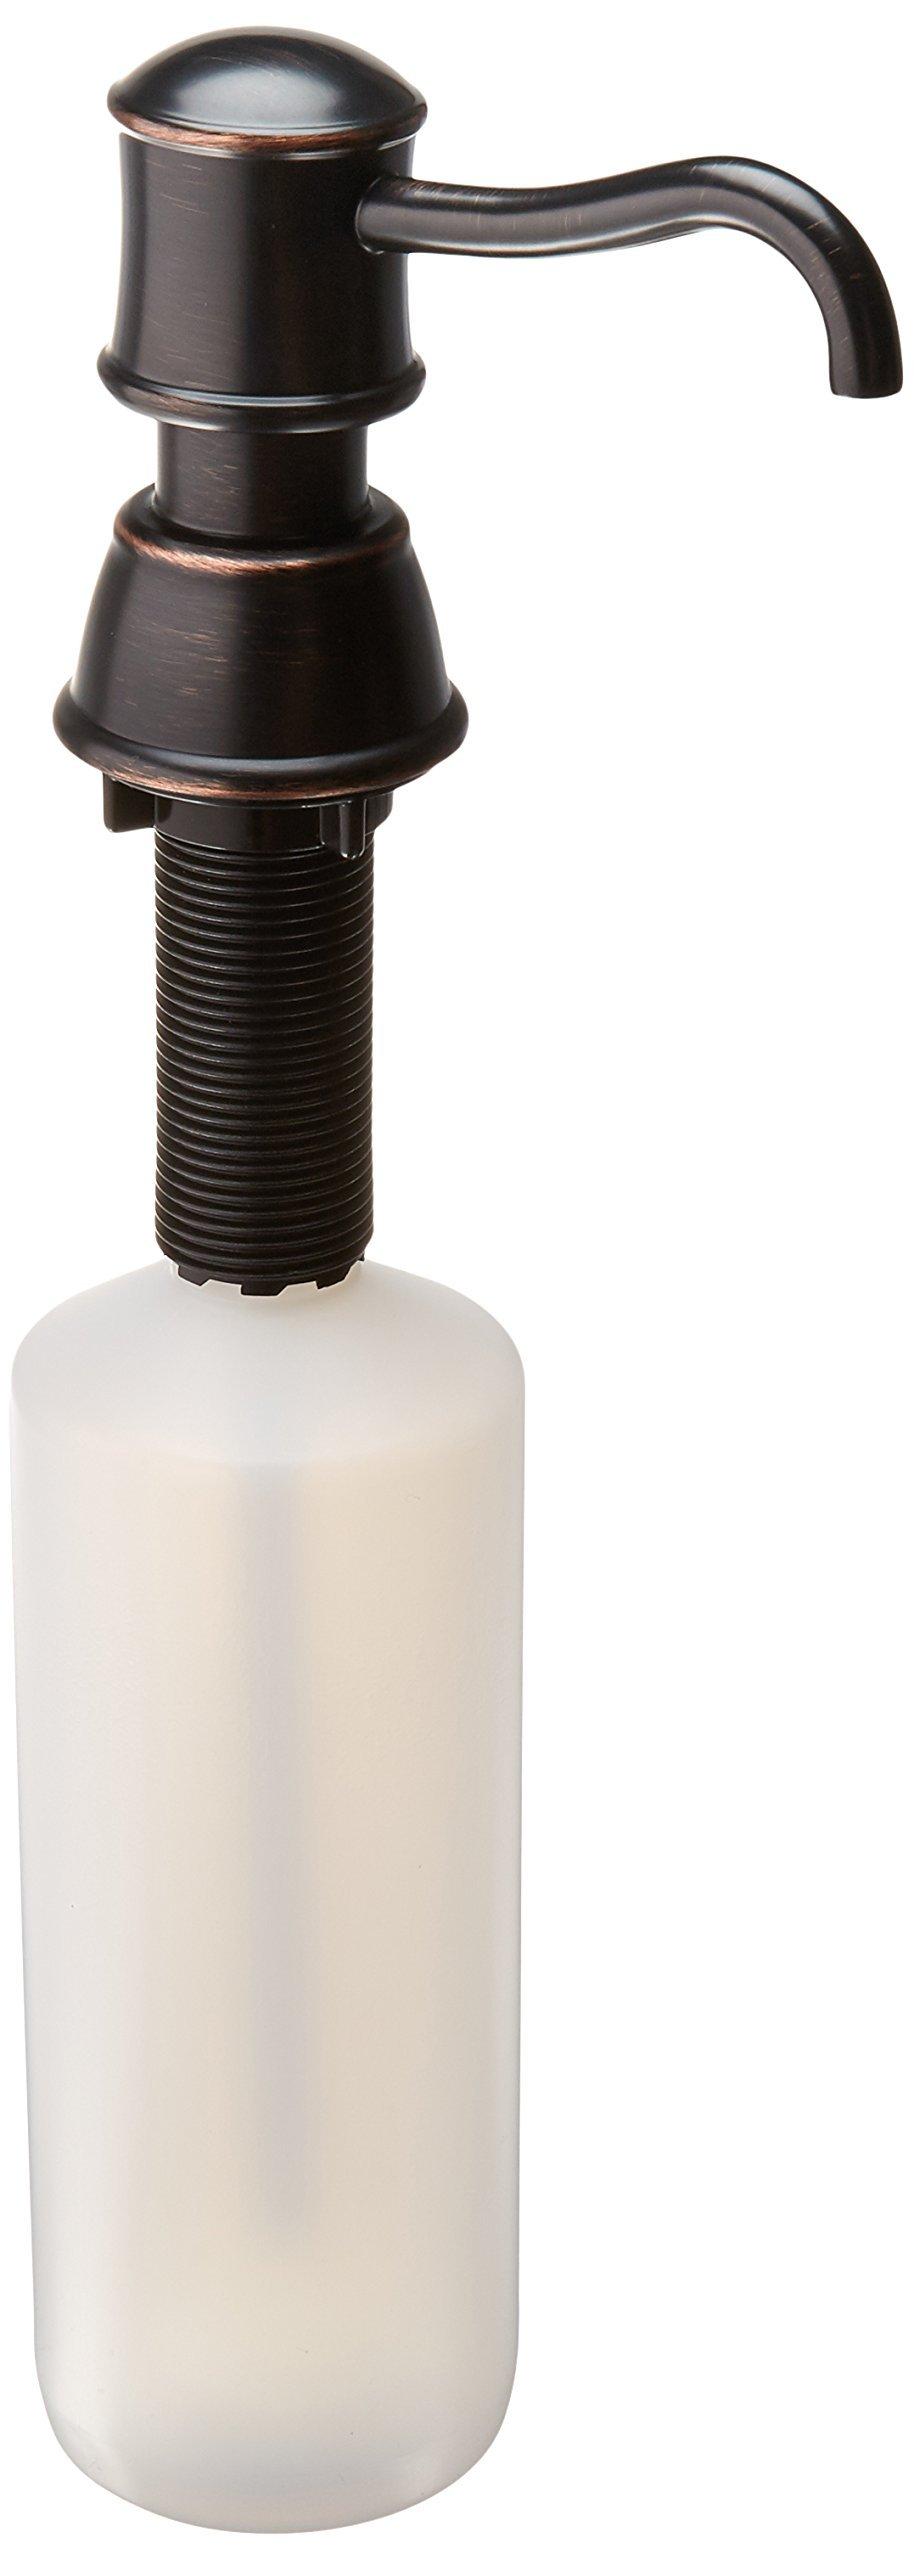 Pfister 960612Y Avalon Soap Dispenser, Tuscan Bronze